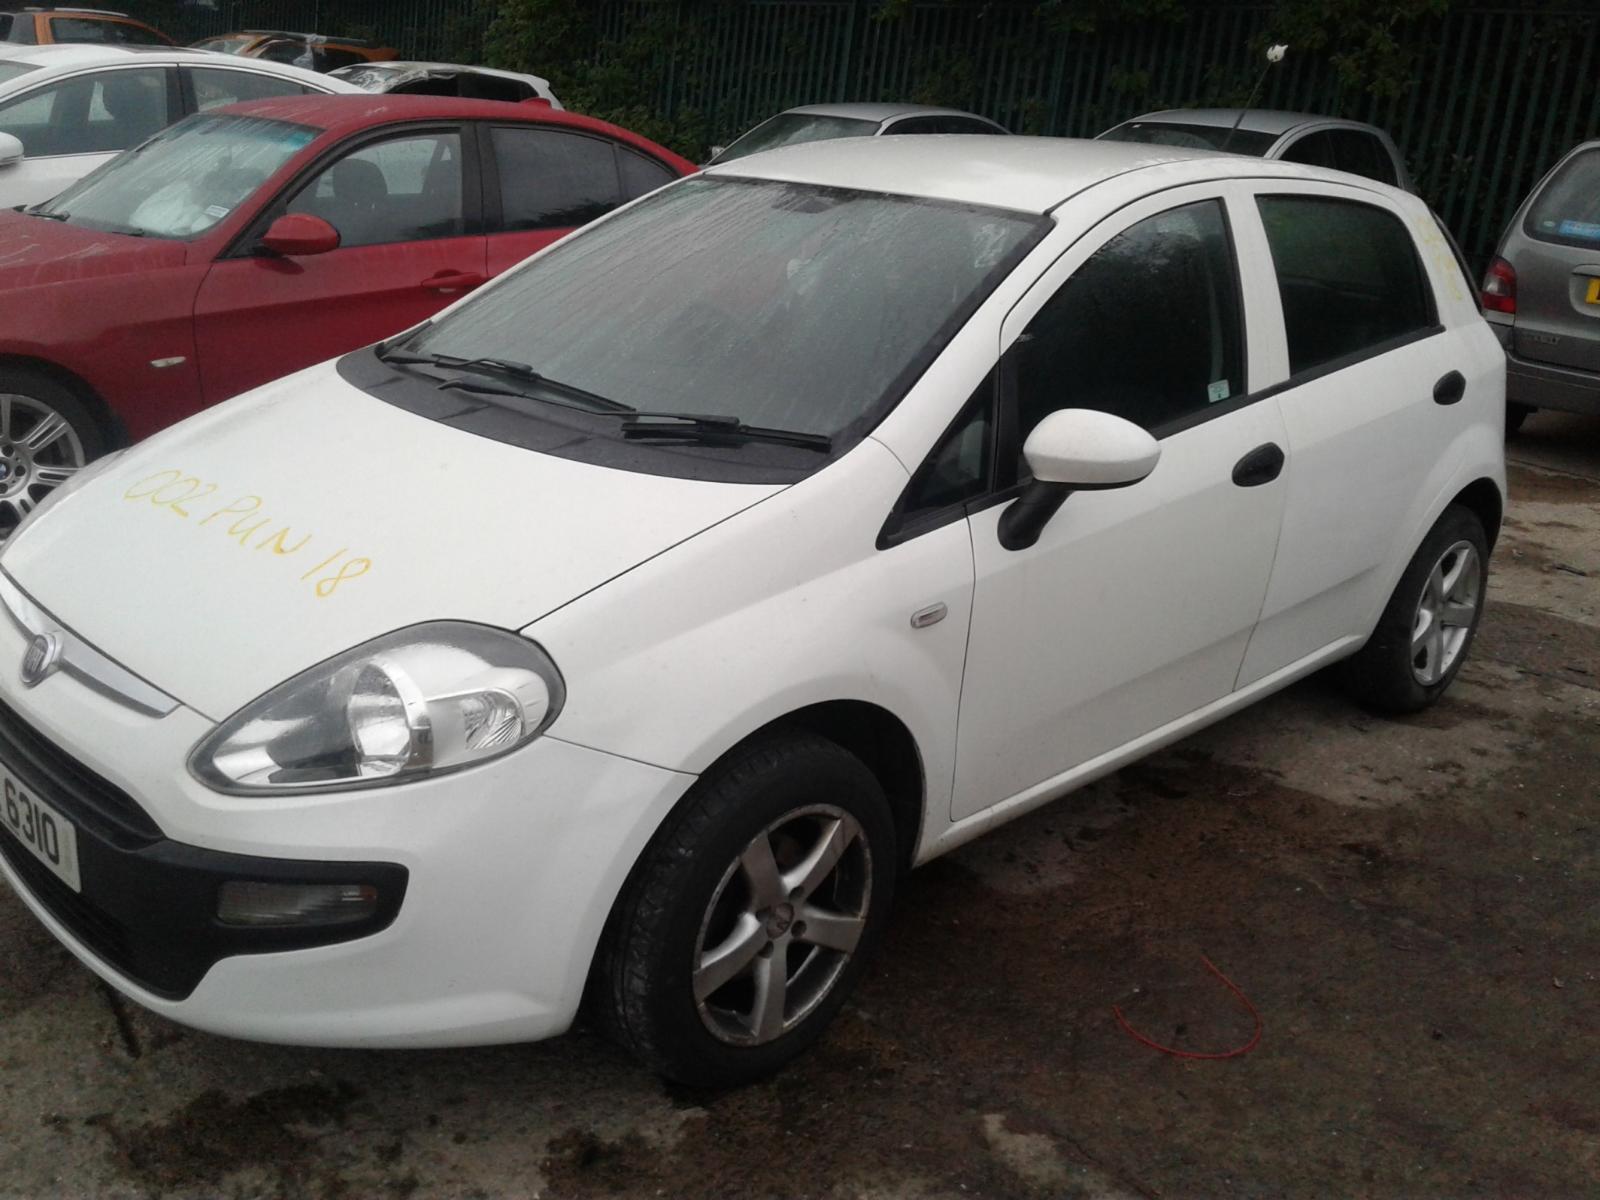 2010 Fiat PUNTO EVO ACTIVE Image